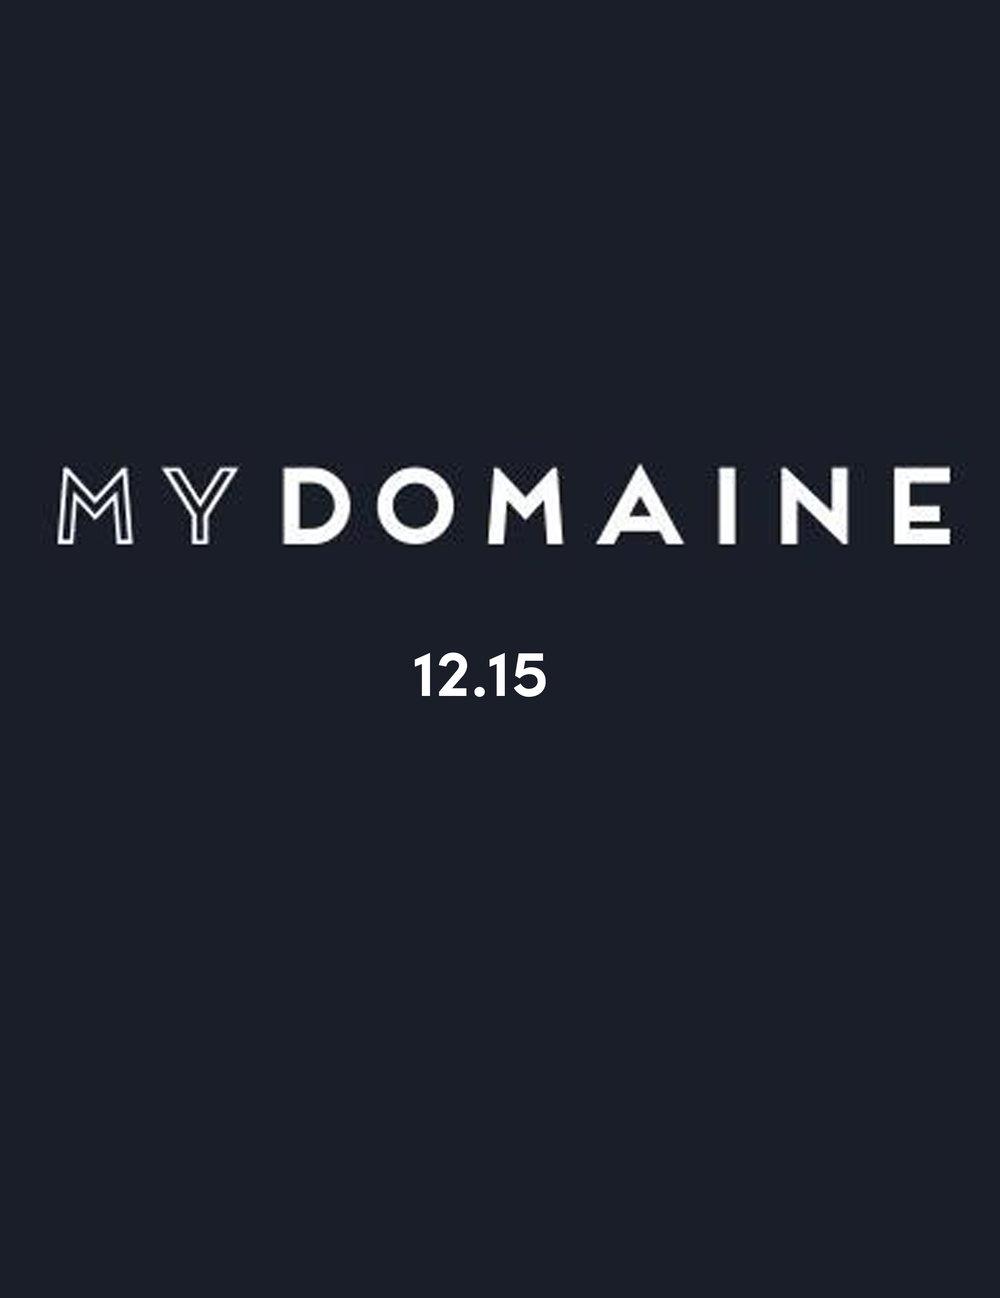 MyDomiane-Cover-Navy-12.15.jpg